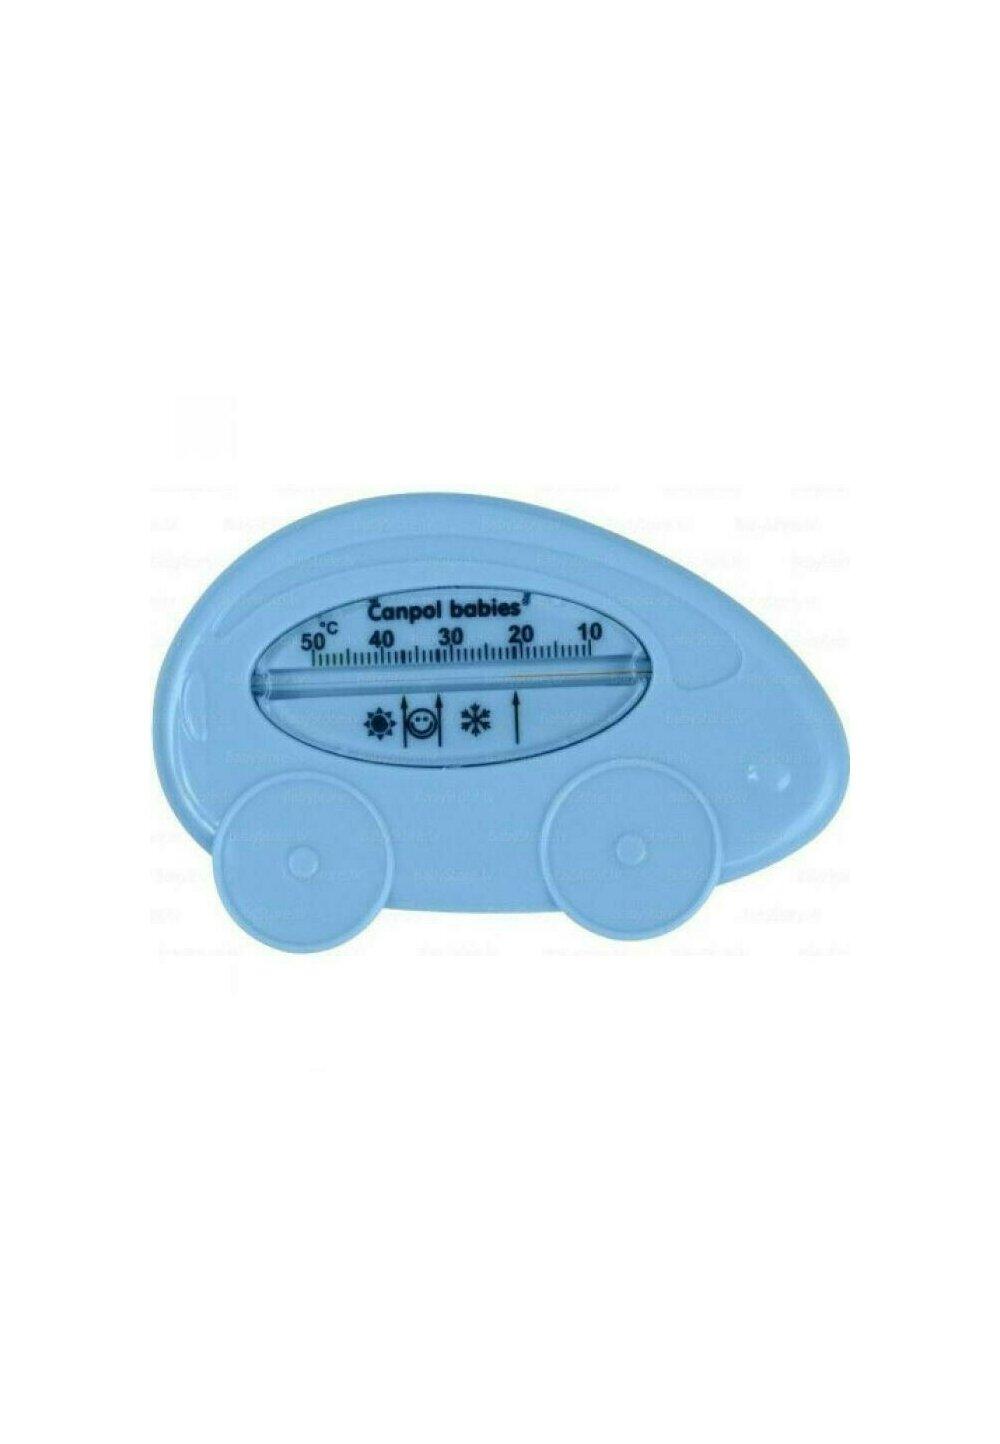 Termometru pentru baie, masinuta, albastra 2/784 imagine